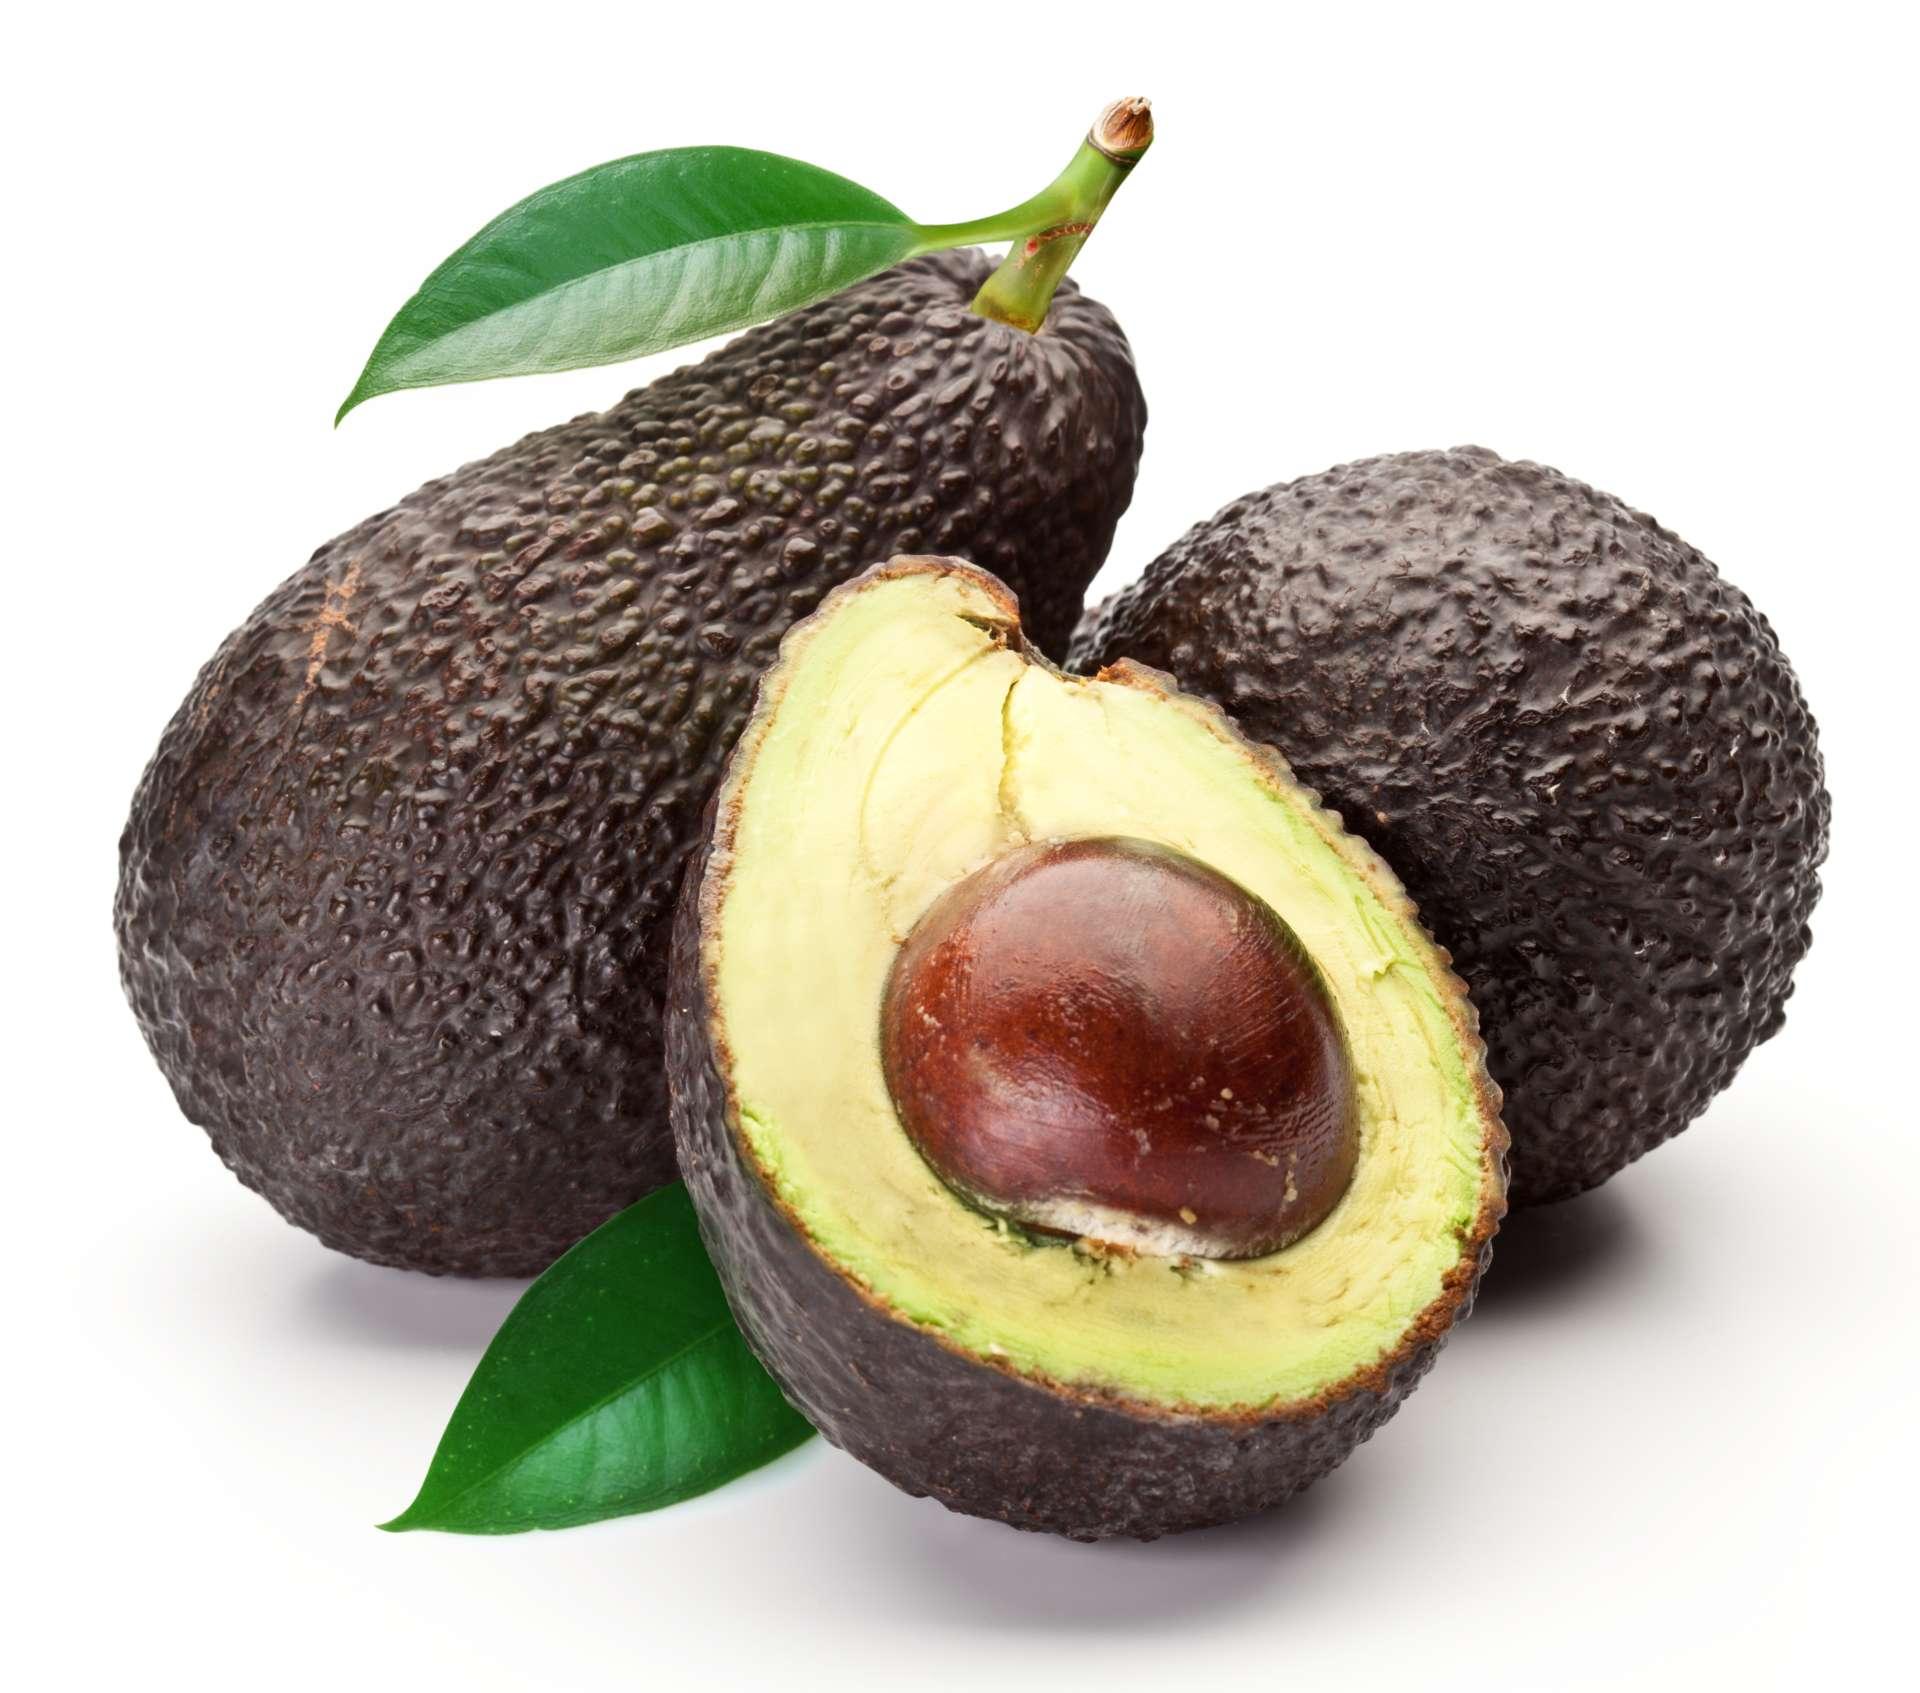 Avocado - Alles über die Avocado